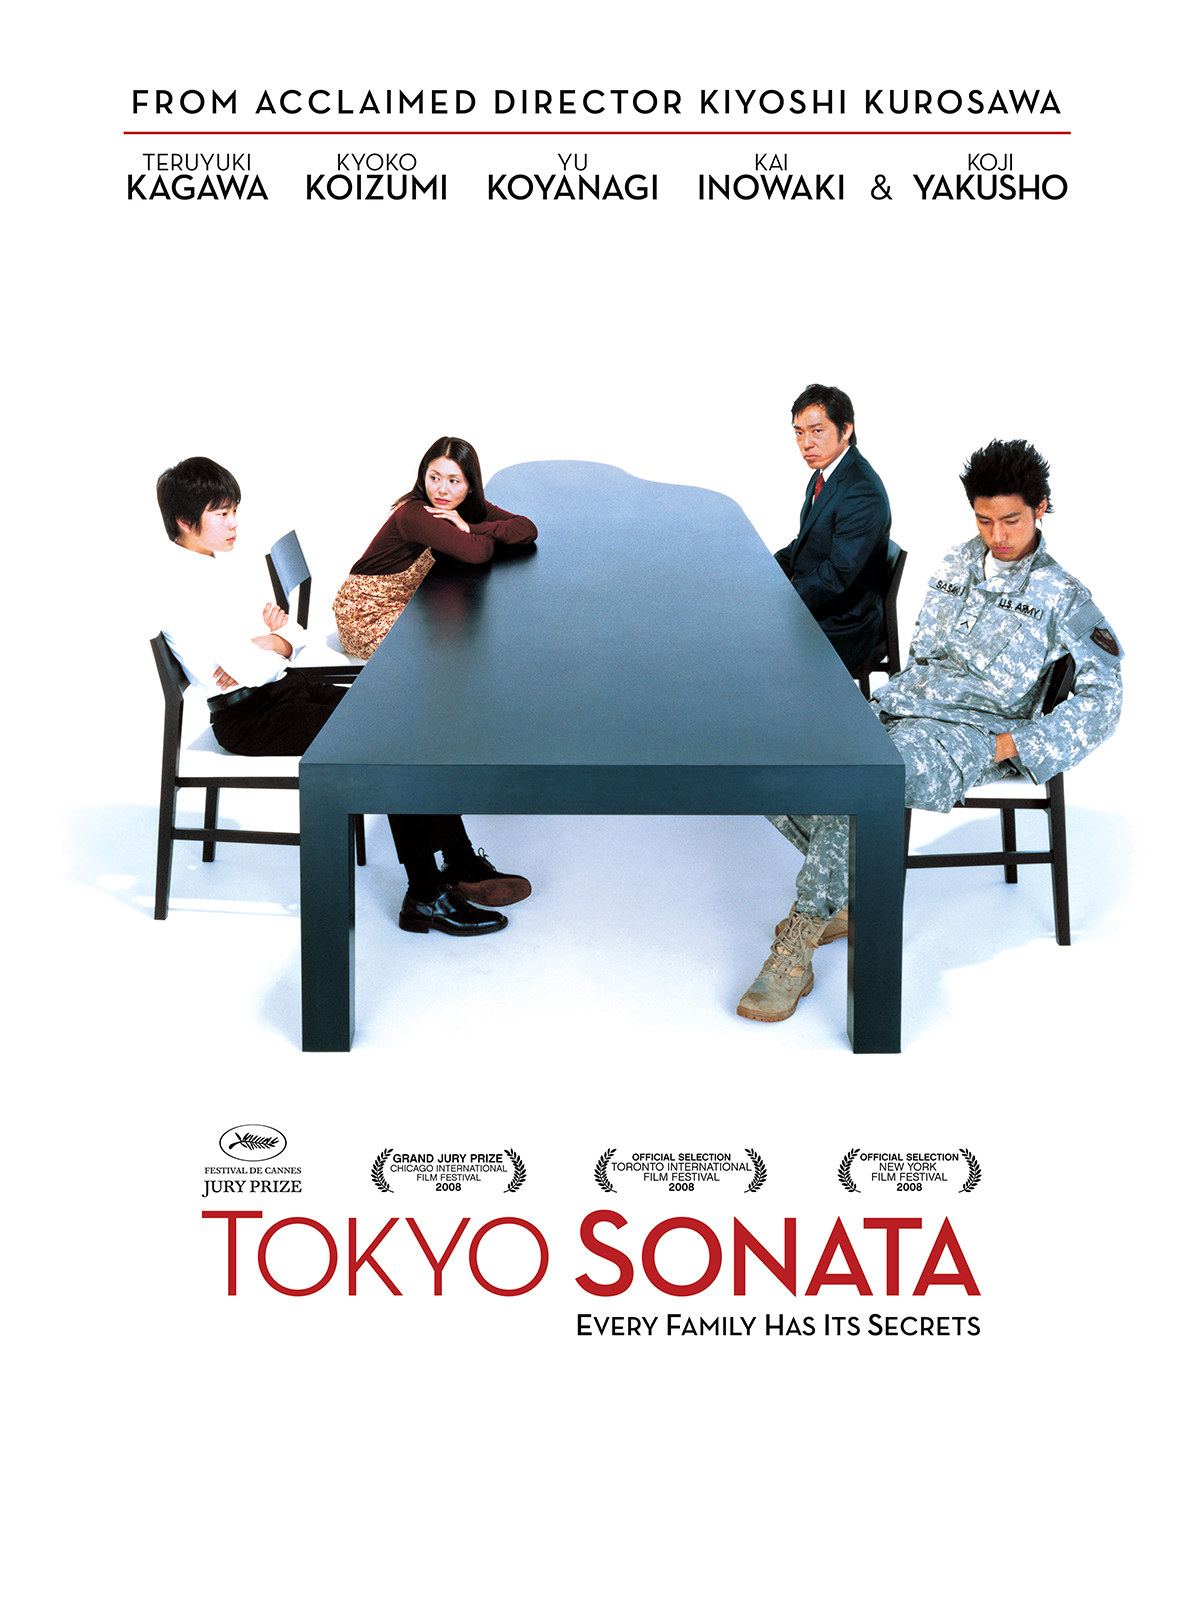 Here-TokyoSonata-Full-Image-en-US.jpg